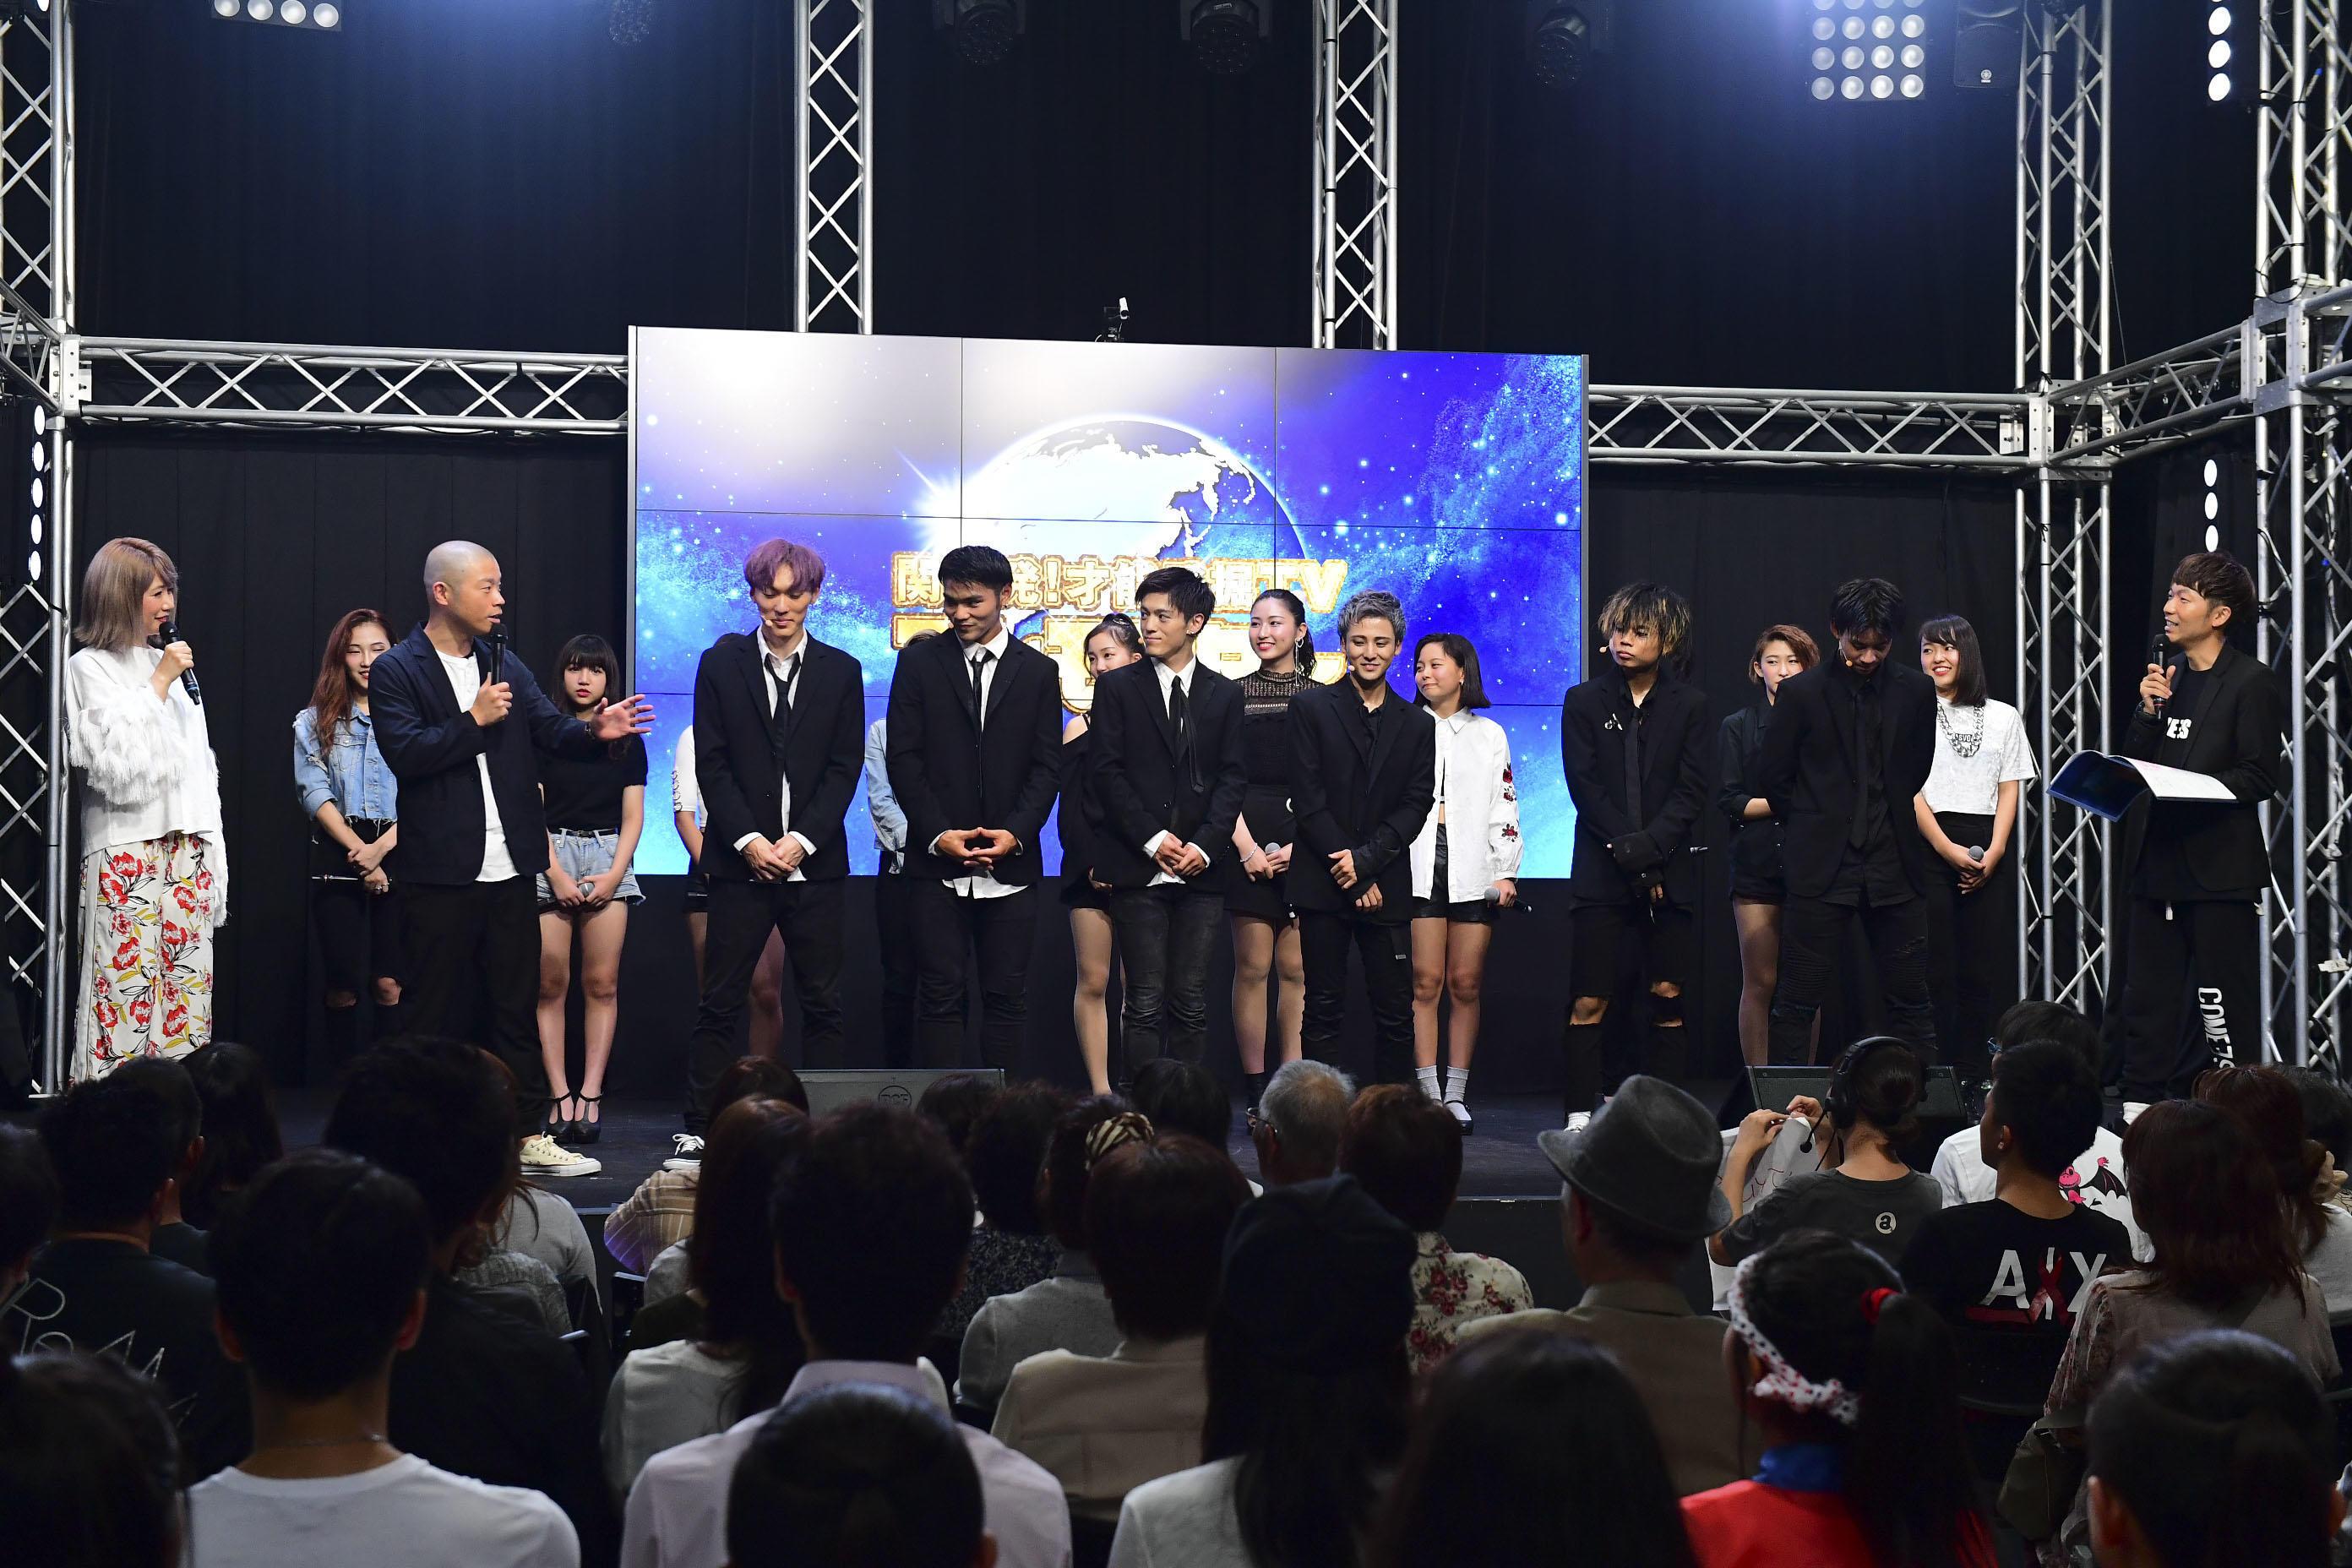 http://news.yoshimoto.co.jp/20170924094114-84c4f72646820a19edb47ed399c8c56953fdef43.jpg